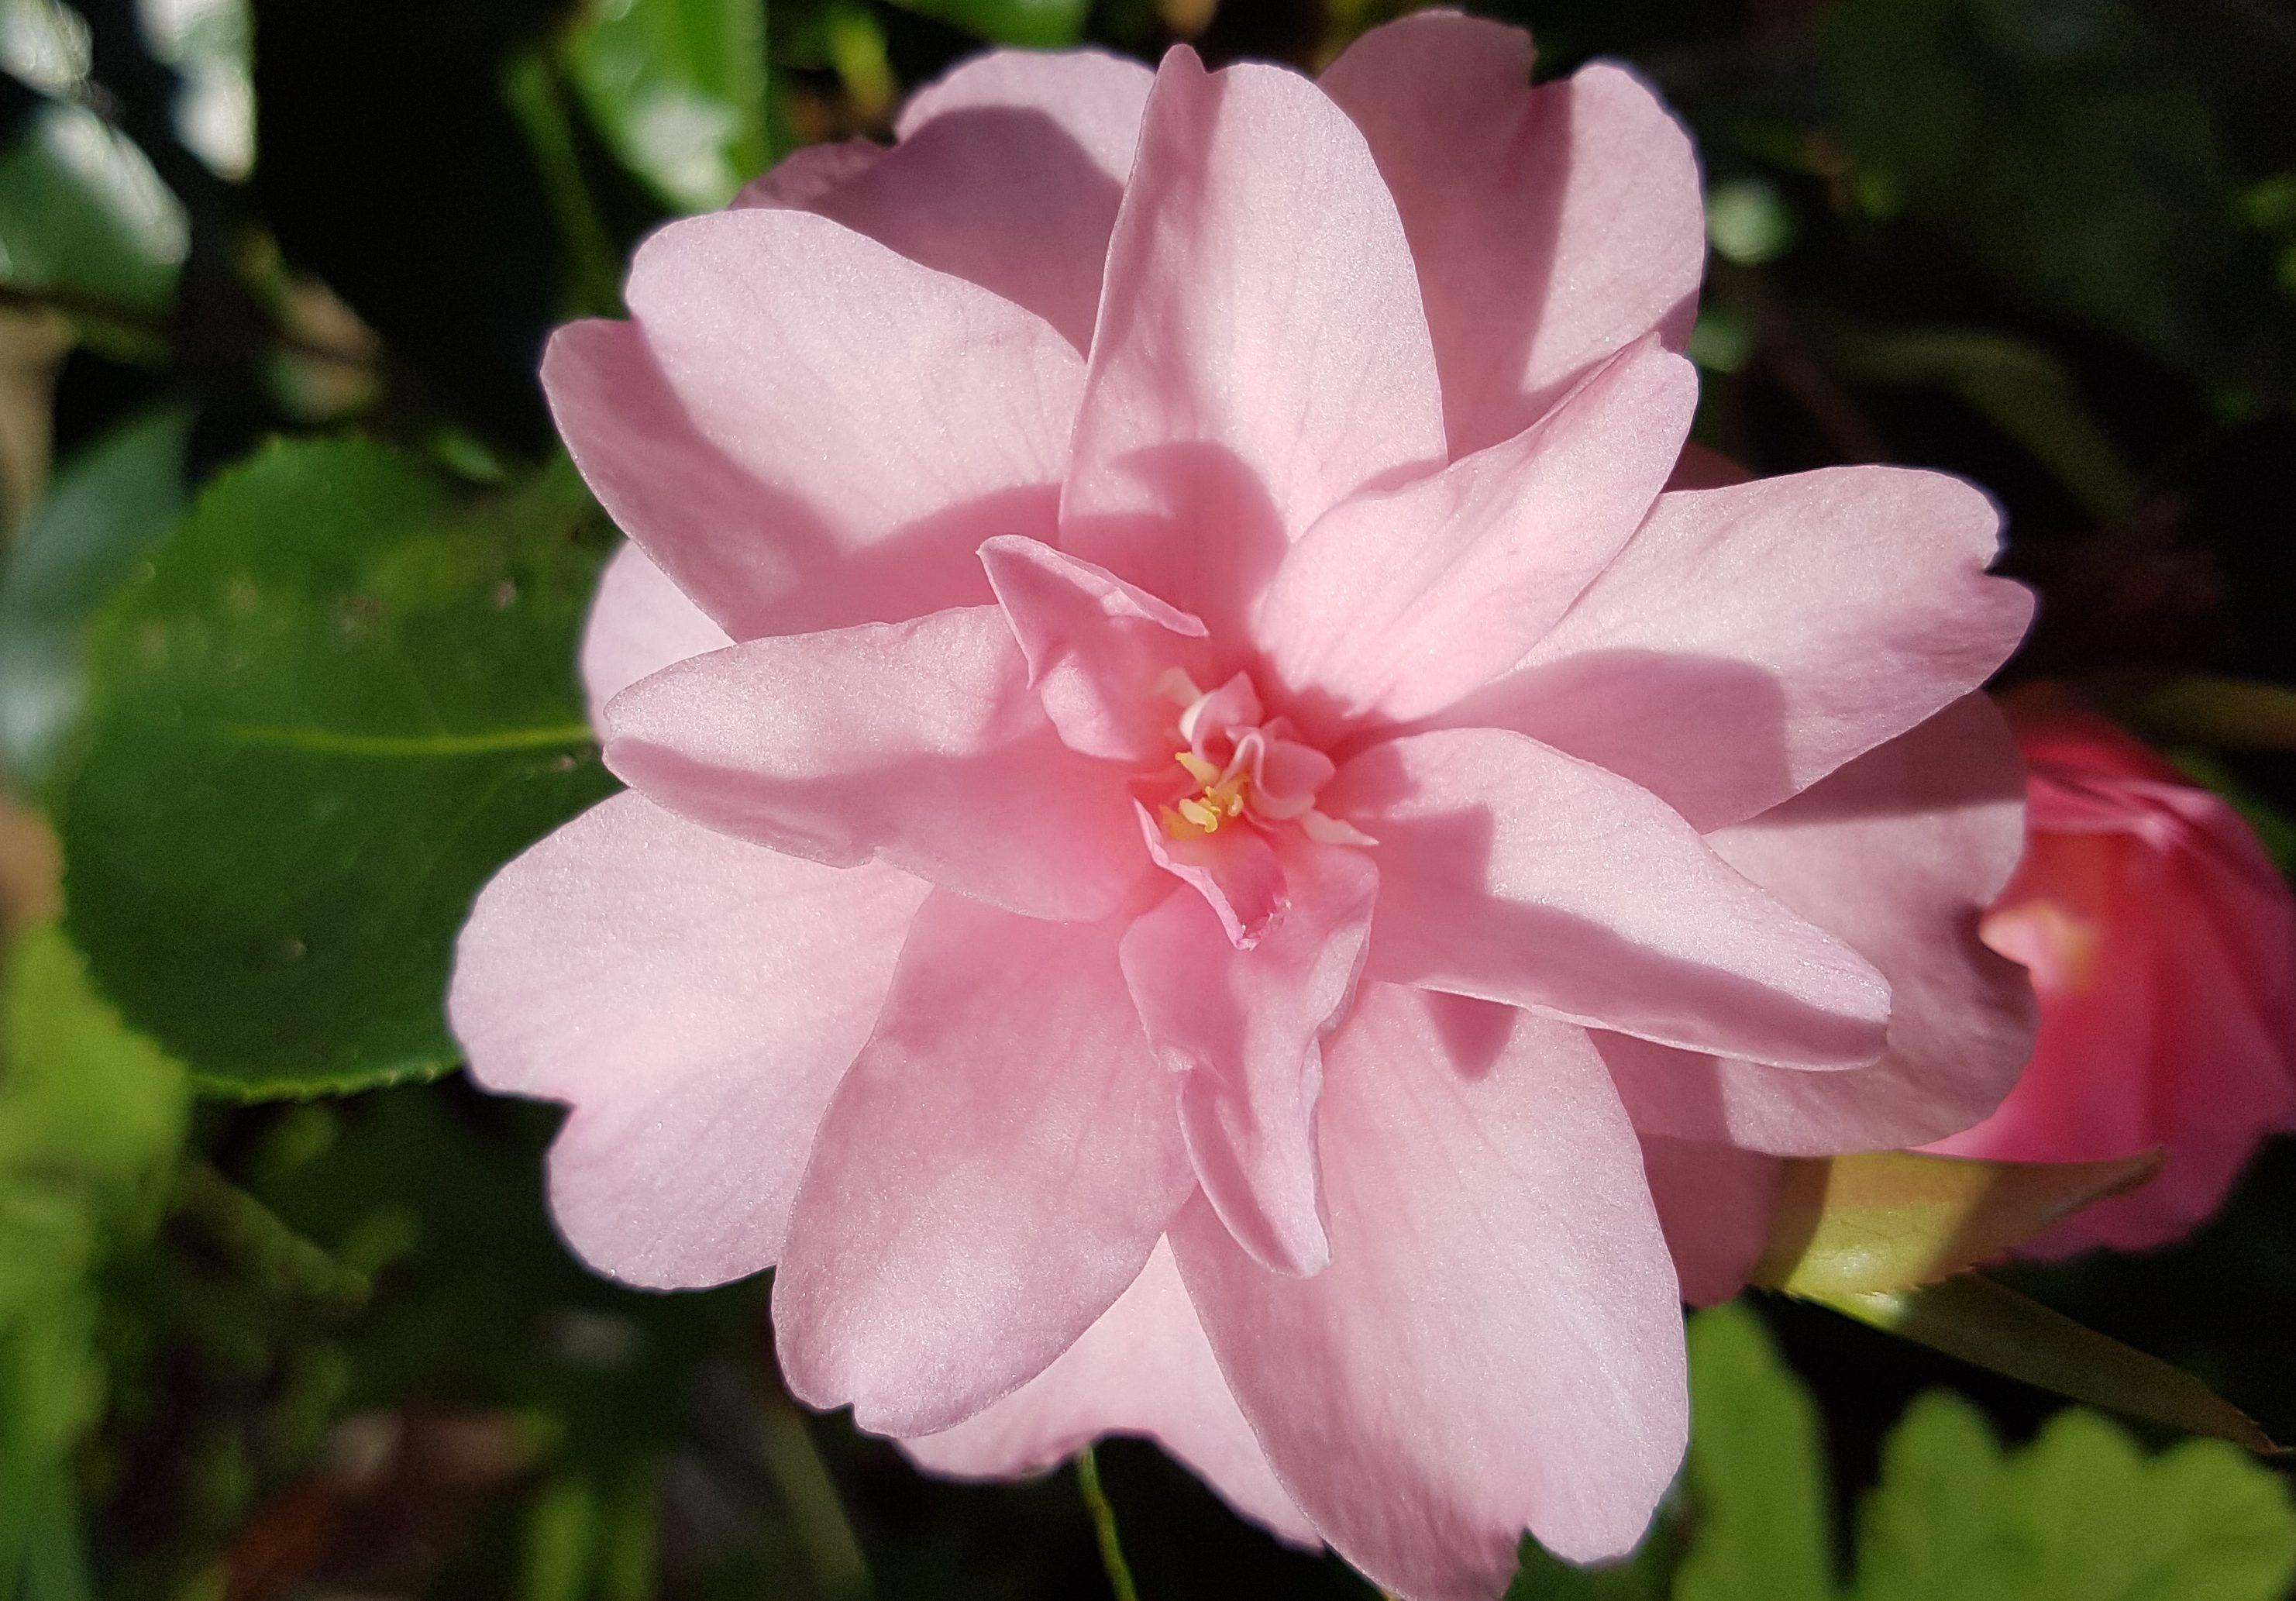 Dronninga i vinterhagen. Camellia japonica eller Kamelia